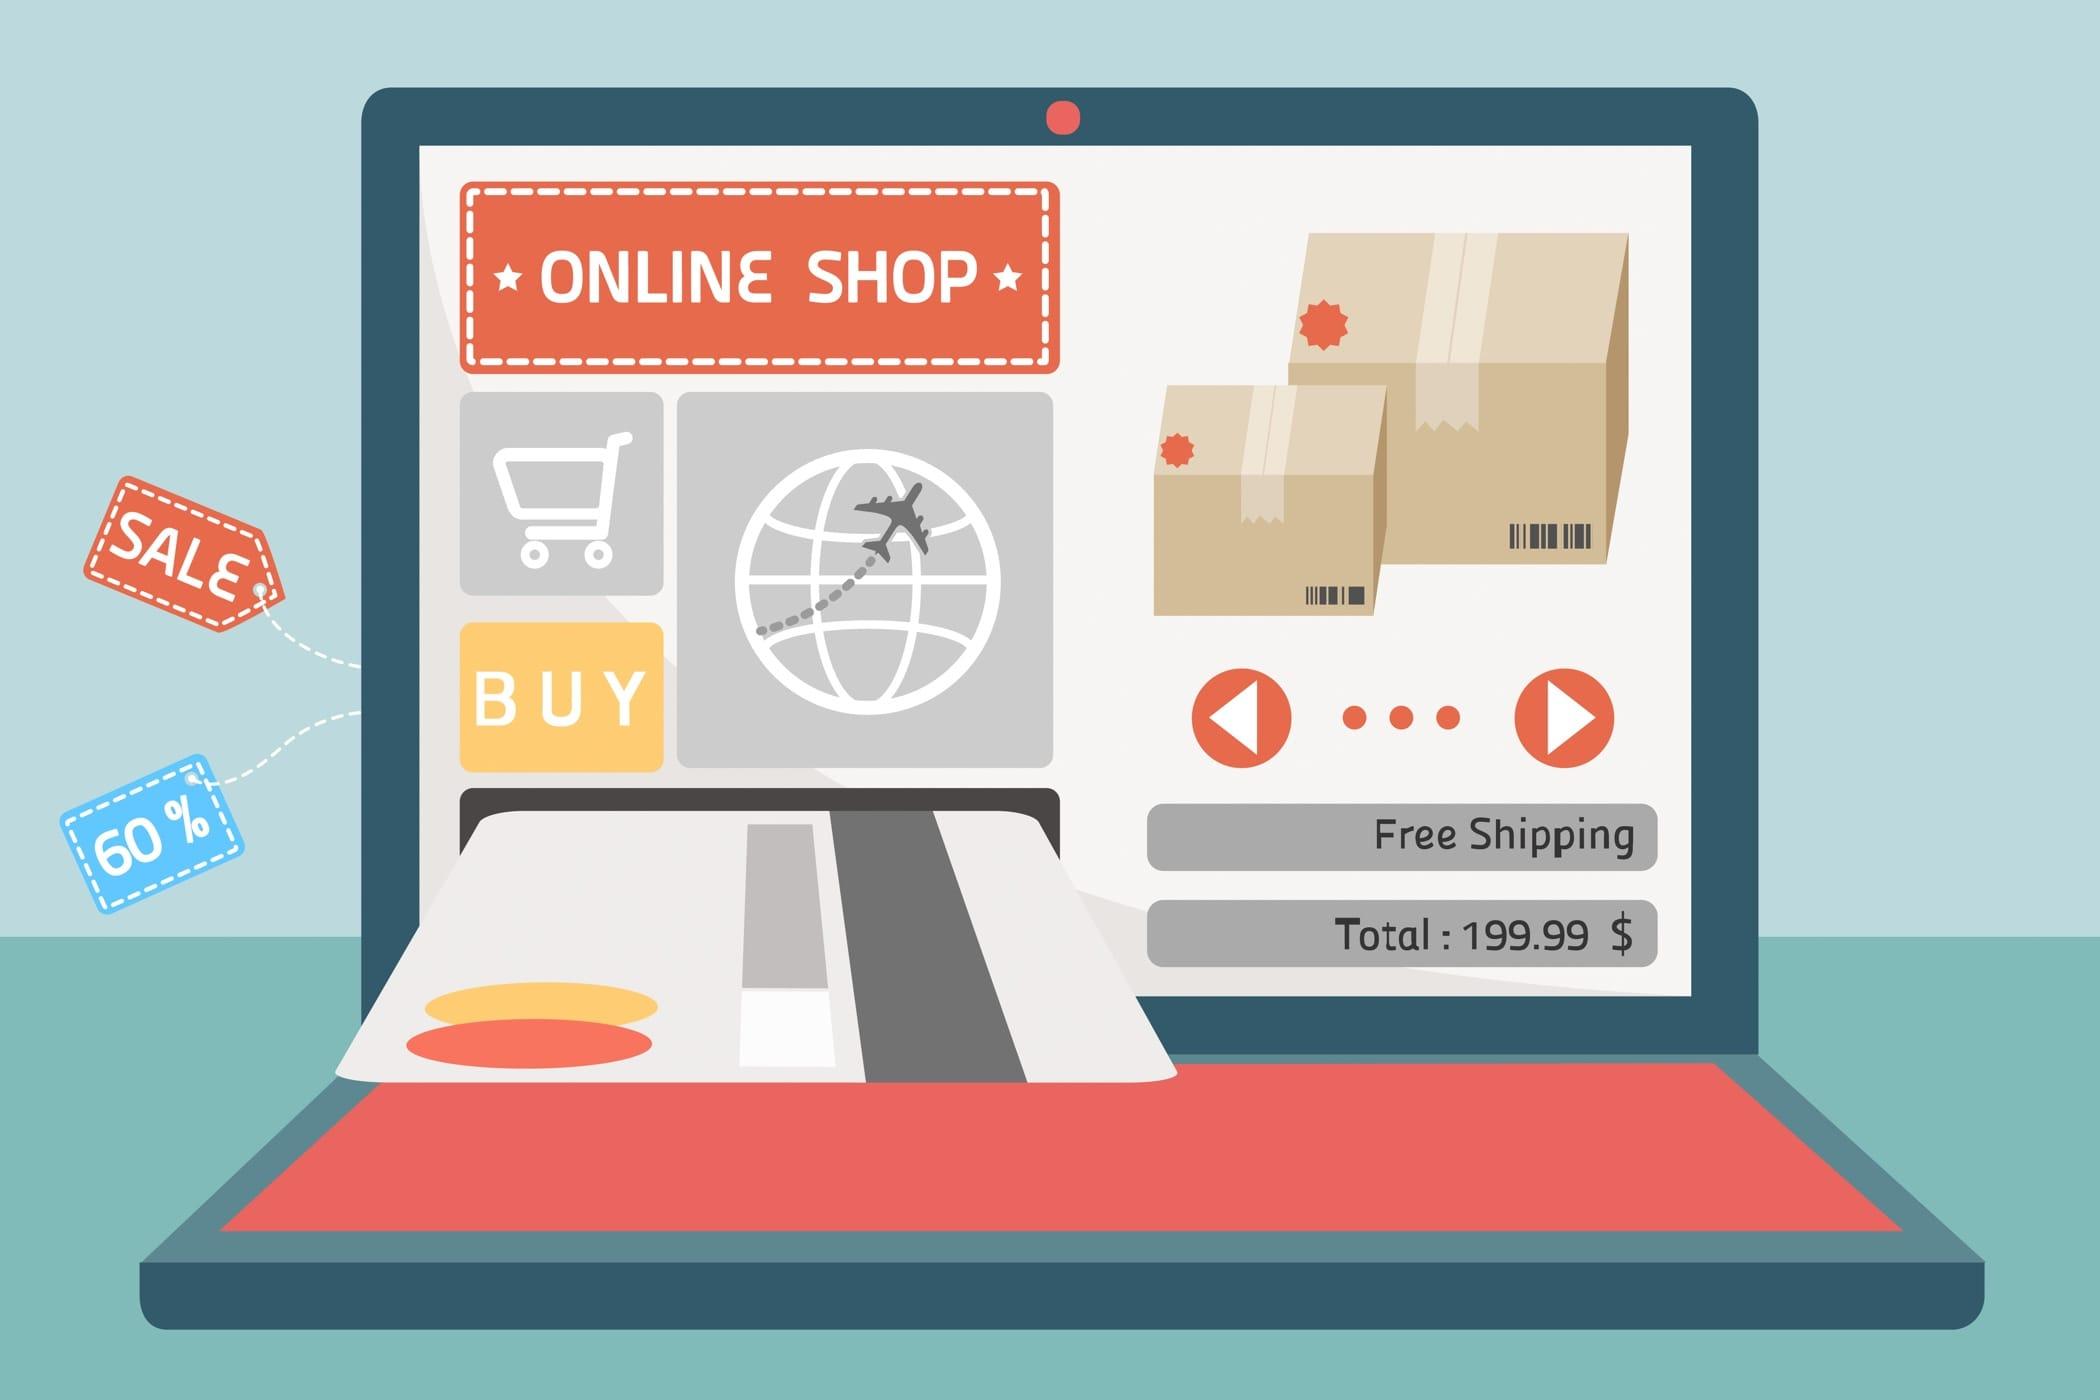 AliEpxress-Rusisia-online-shopping-3.jpg